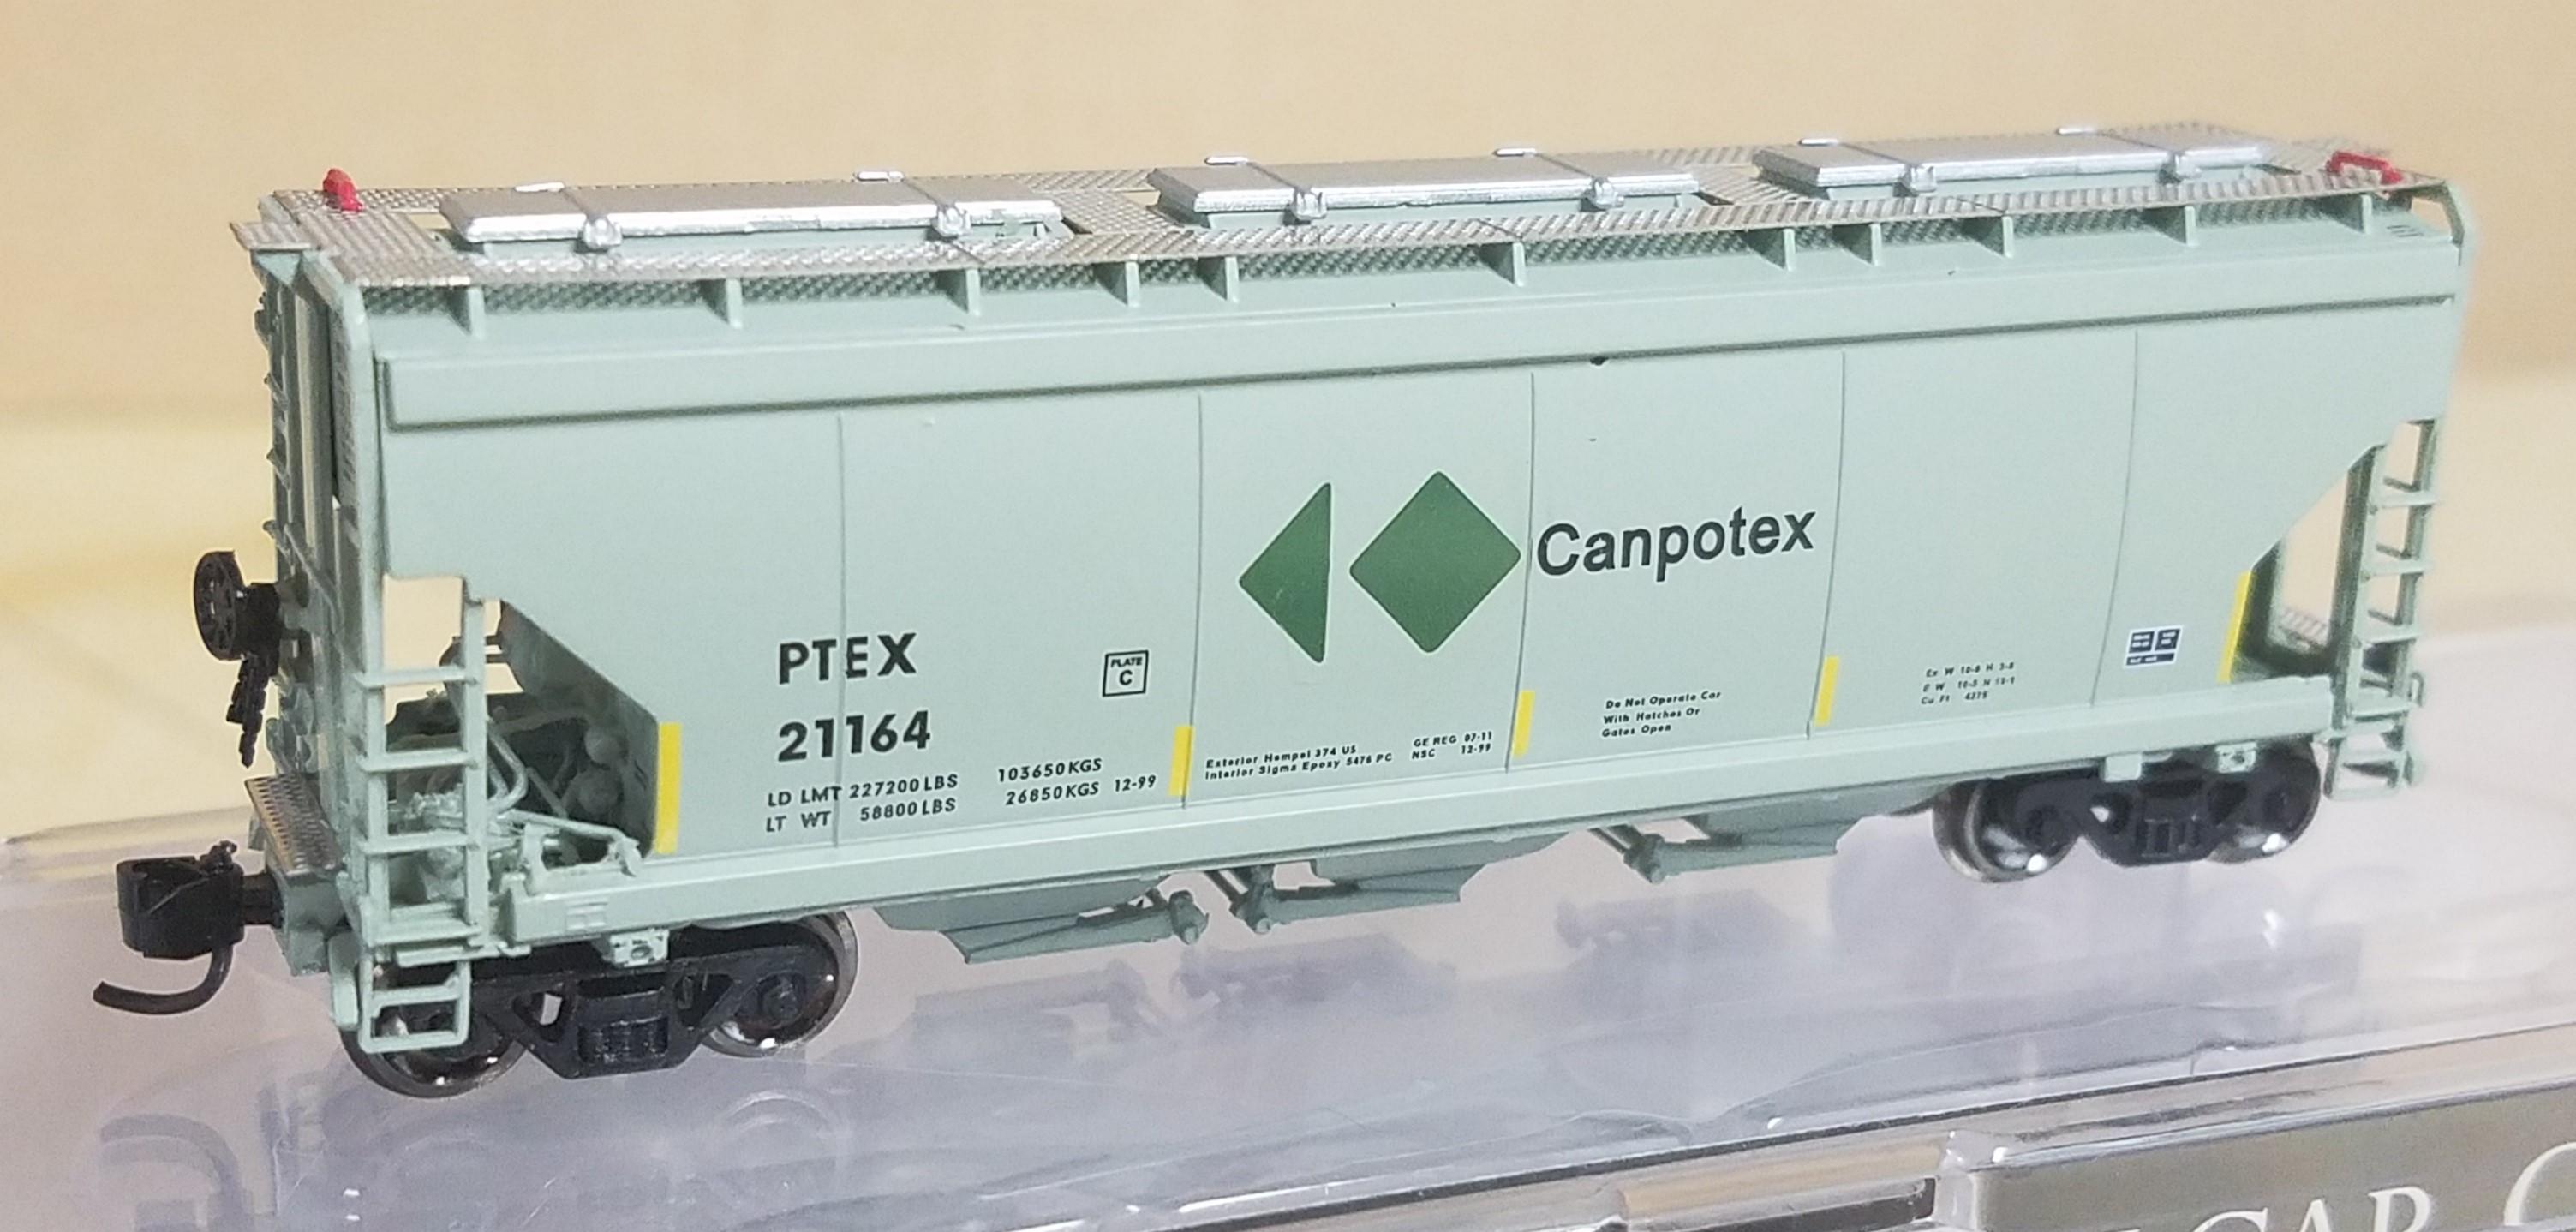 N Scale - North American Railcar - 11-12001002-22 - Covered Hopper, 3-Bay, Potash - Canpotex - 21164